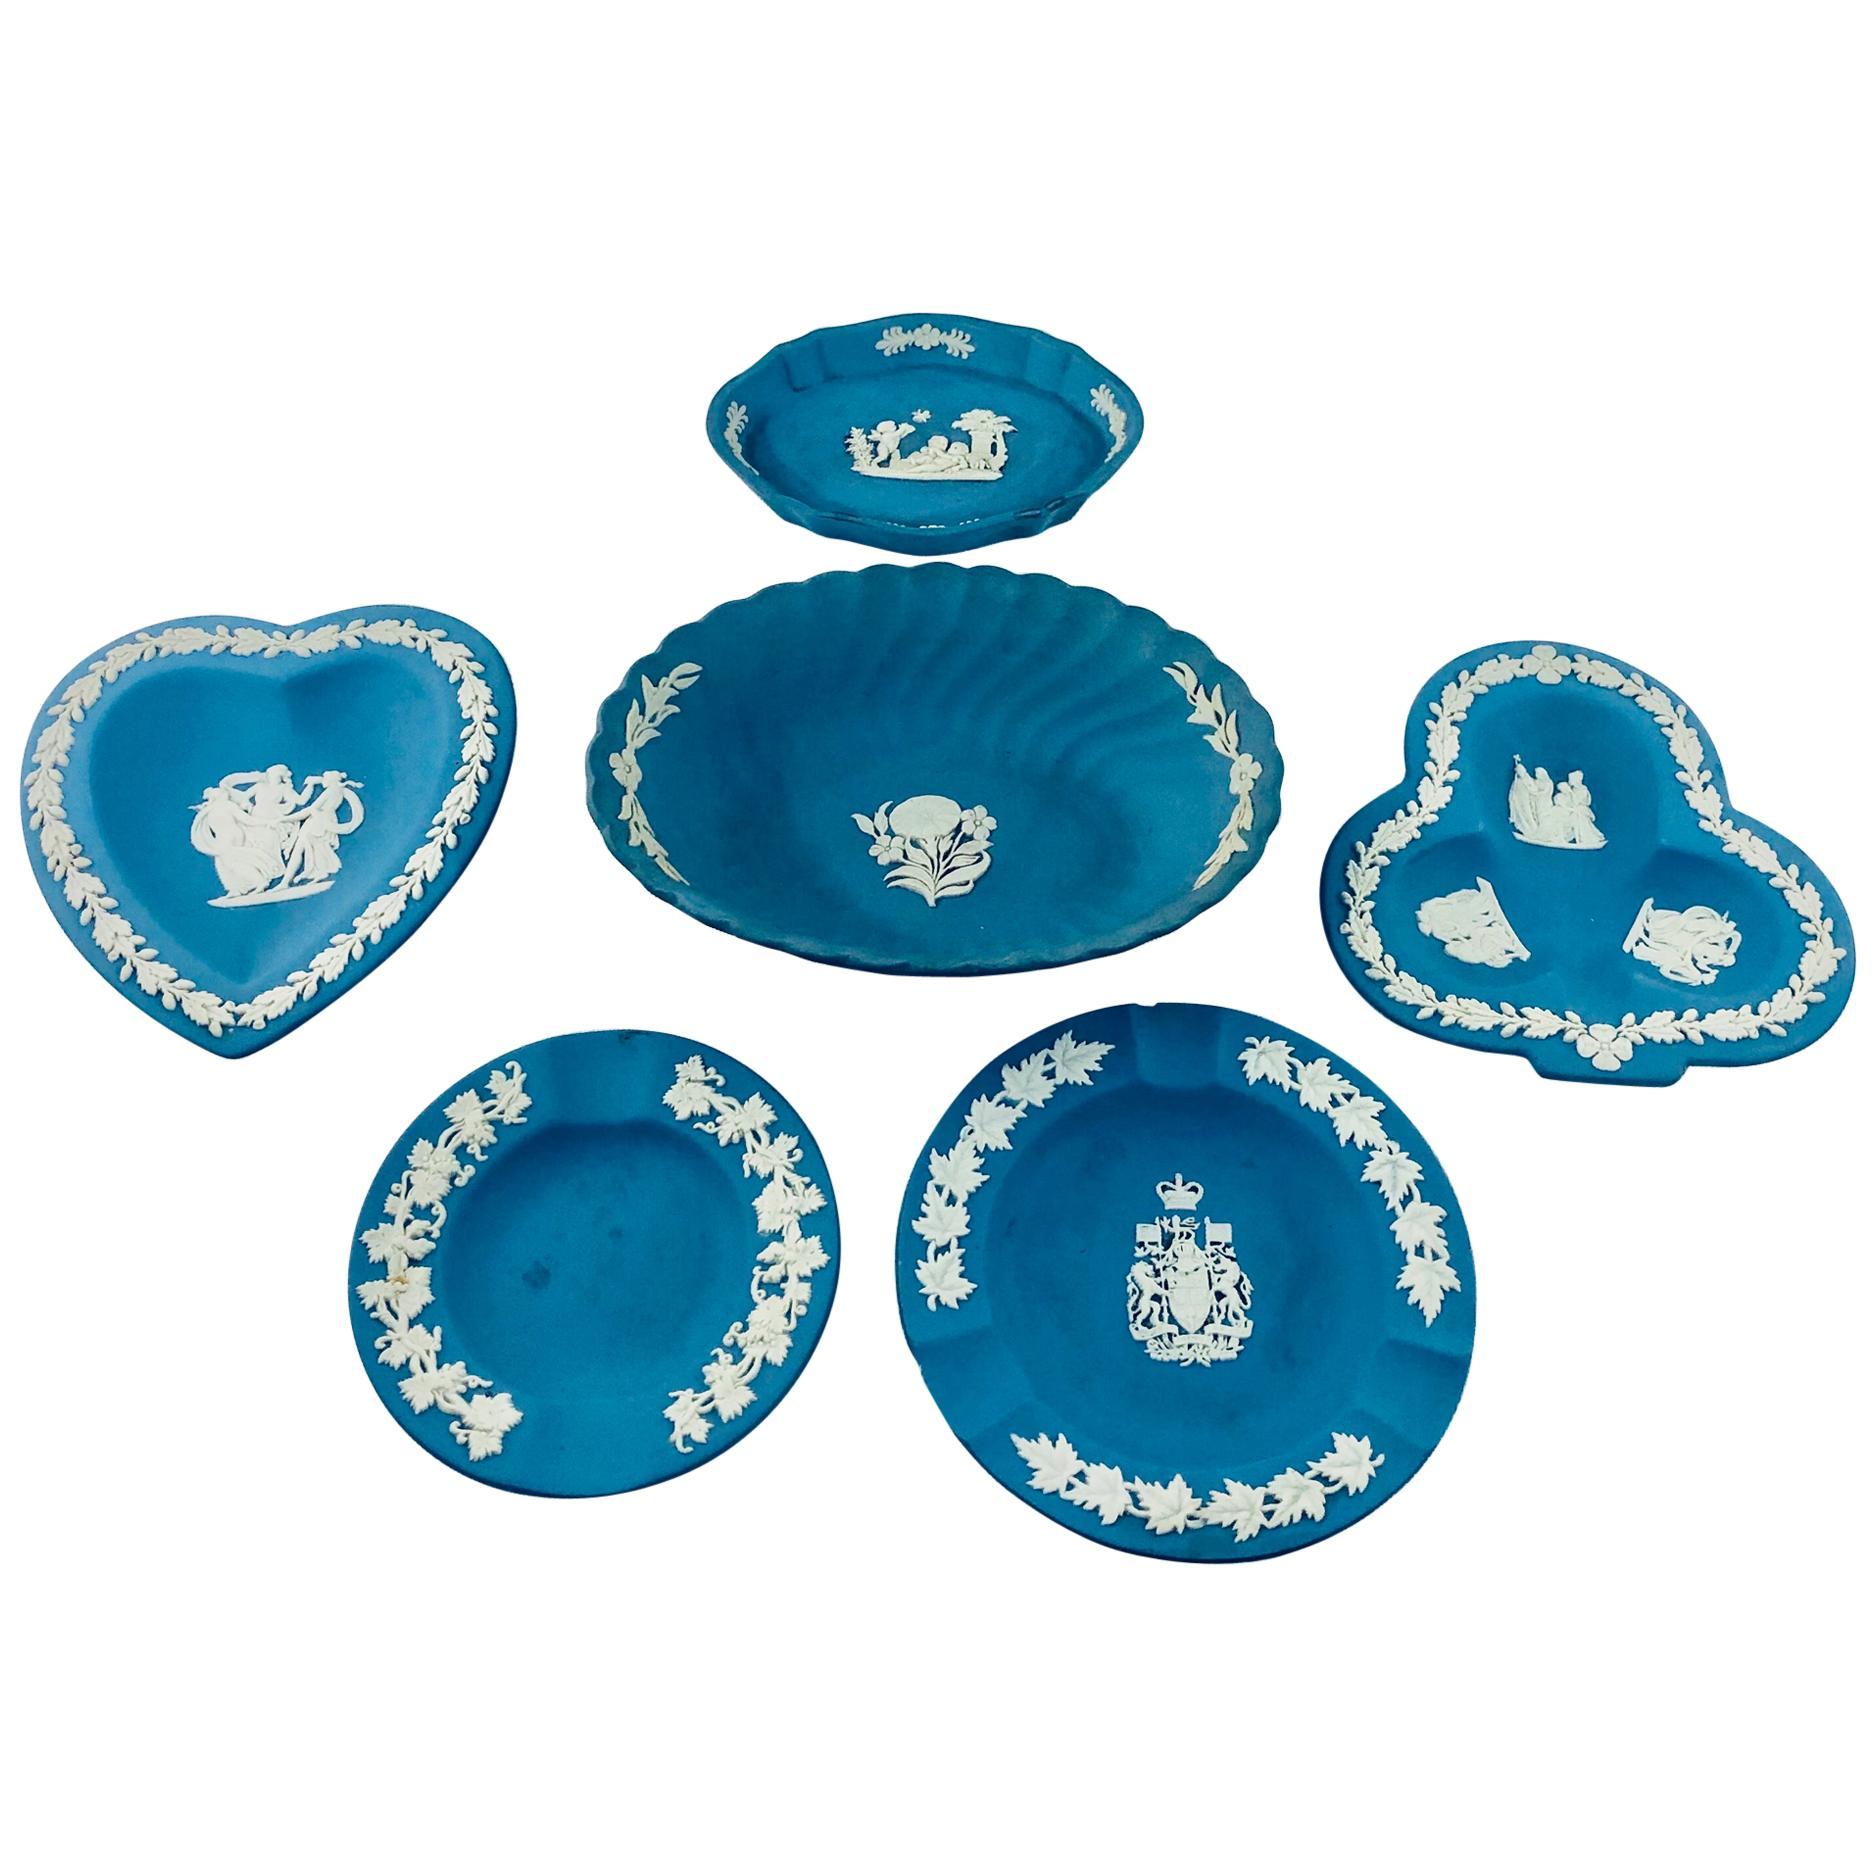 English Wedgwood Blue Jasperware Decorative Small Plates, Set of 6